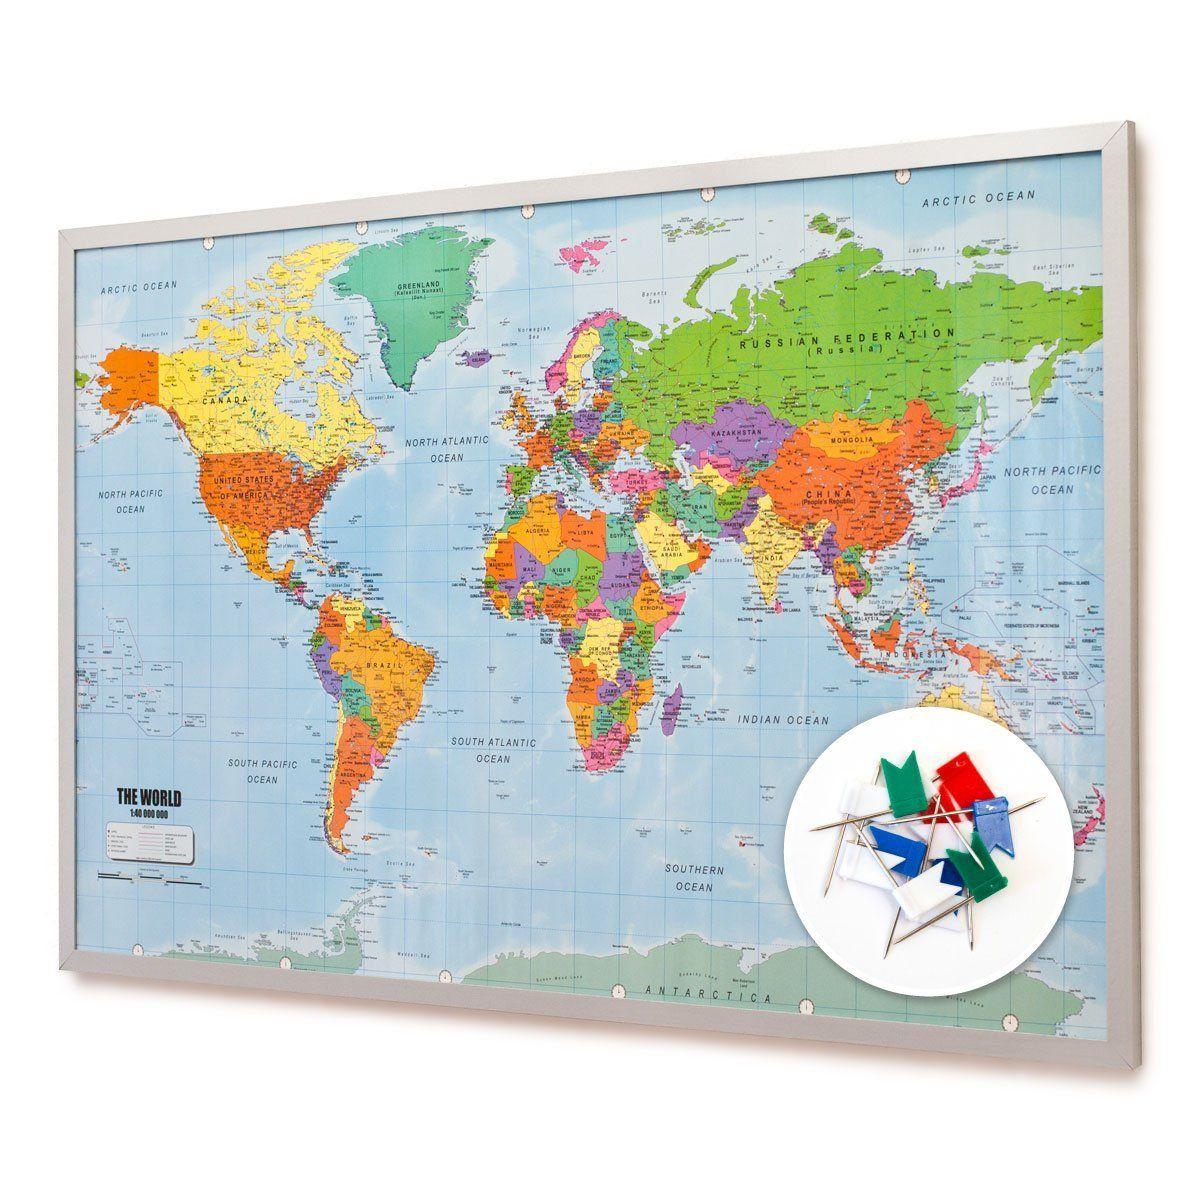 Pin board bulletin board xxl 90x60cm 2 sided world map and cork pin board bulletin board xxl 90x60cm 2 sided world map and cork memo board sciox Gallery